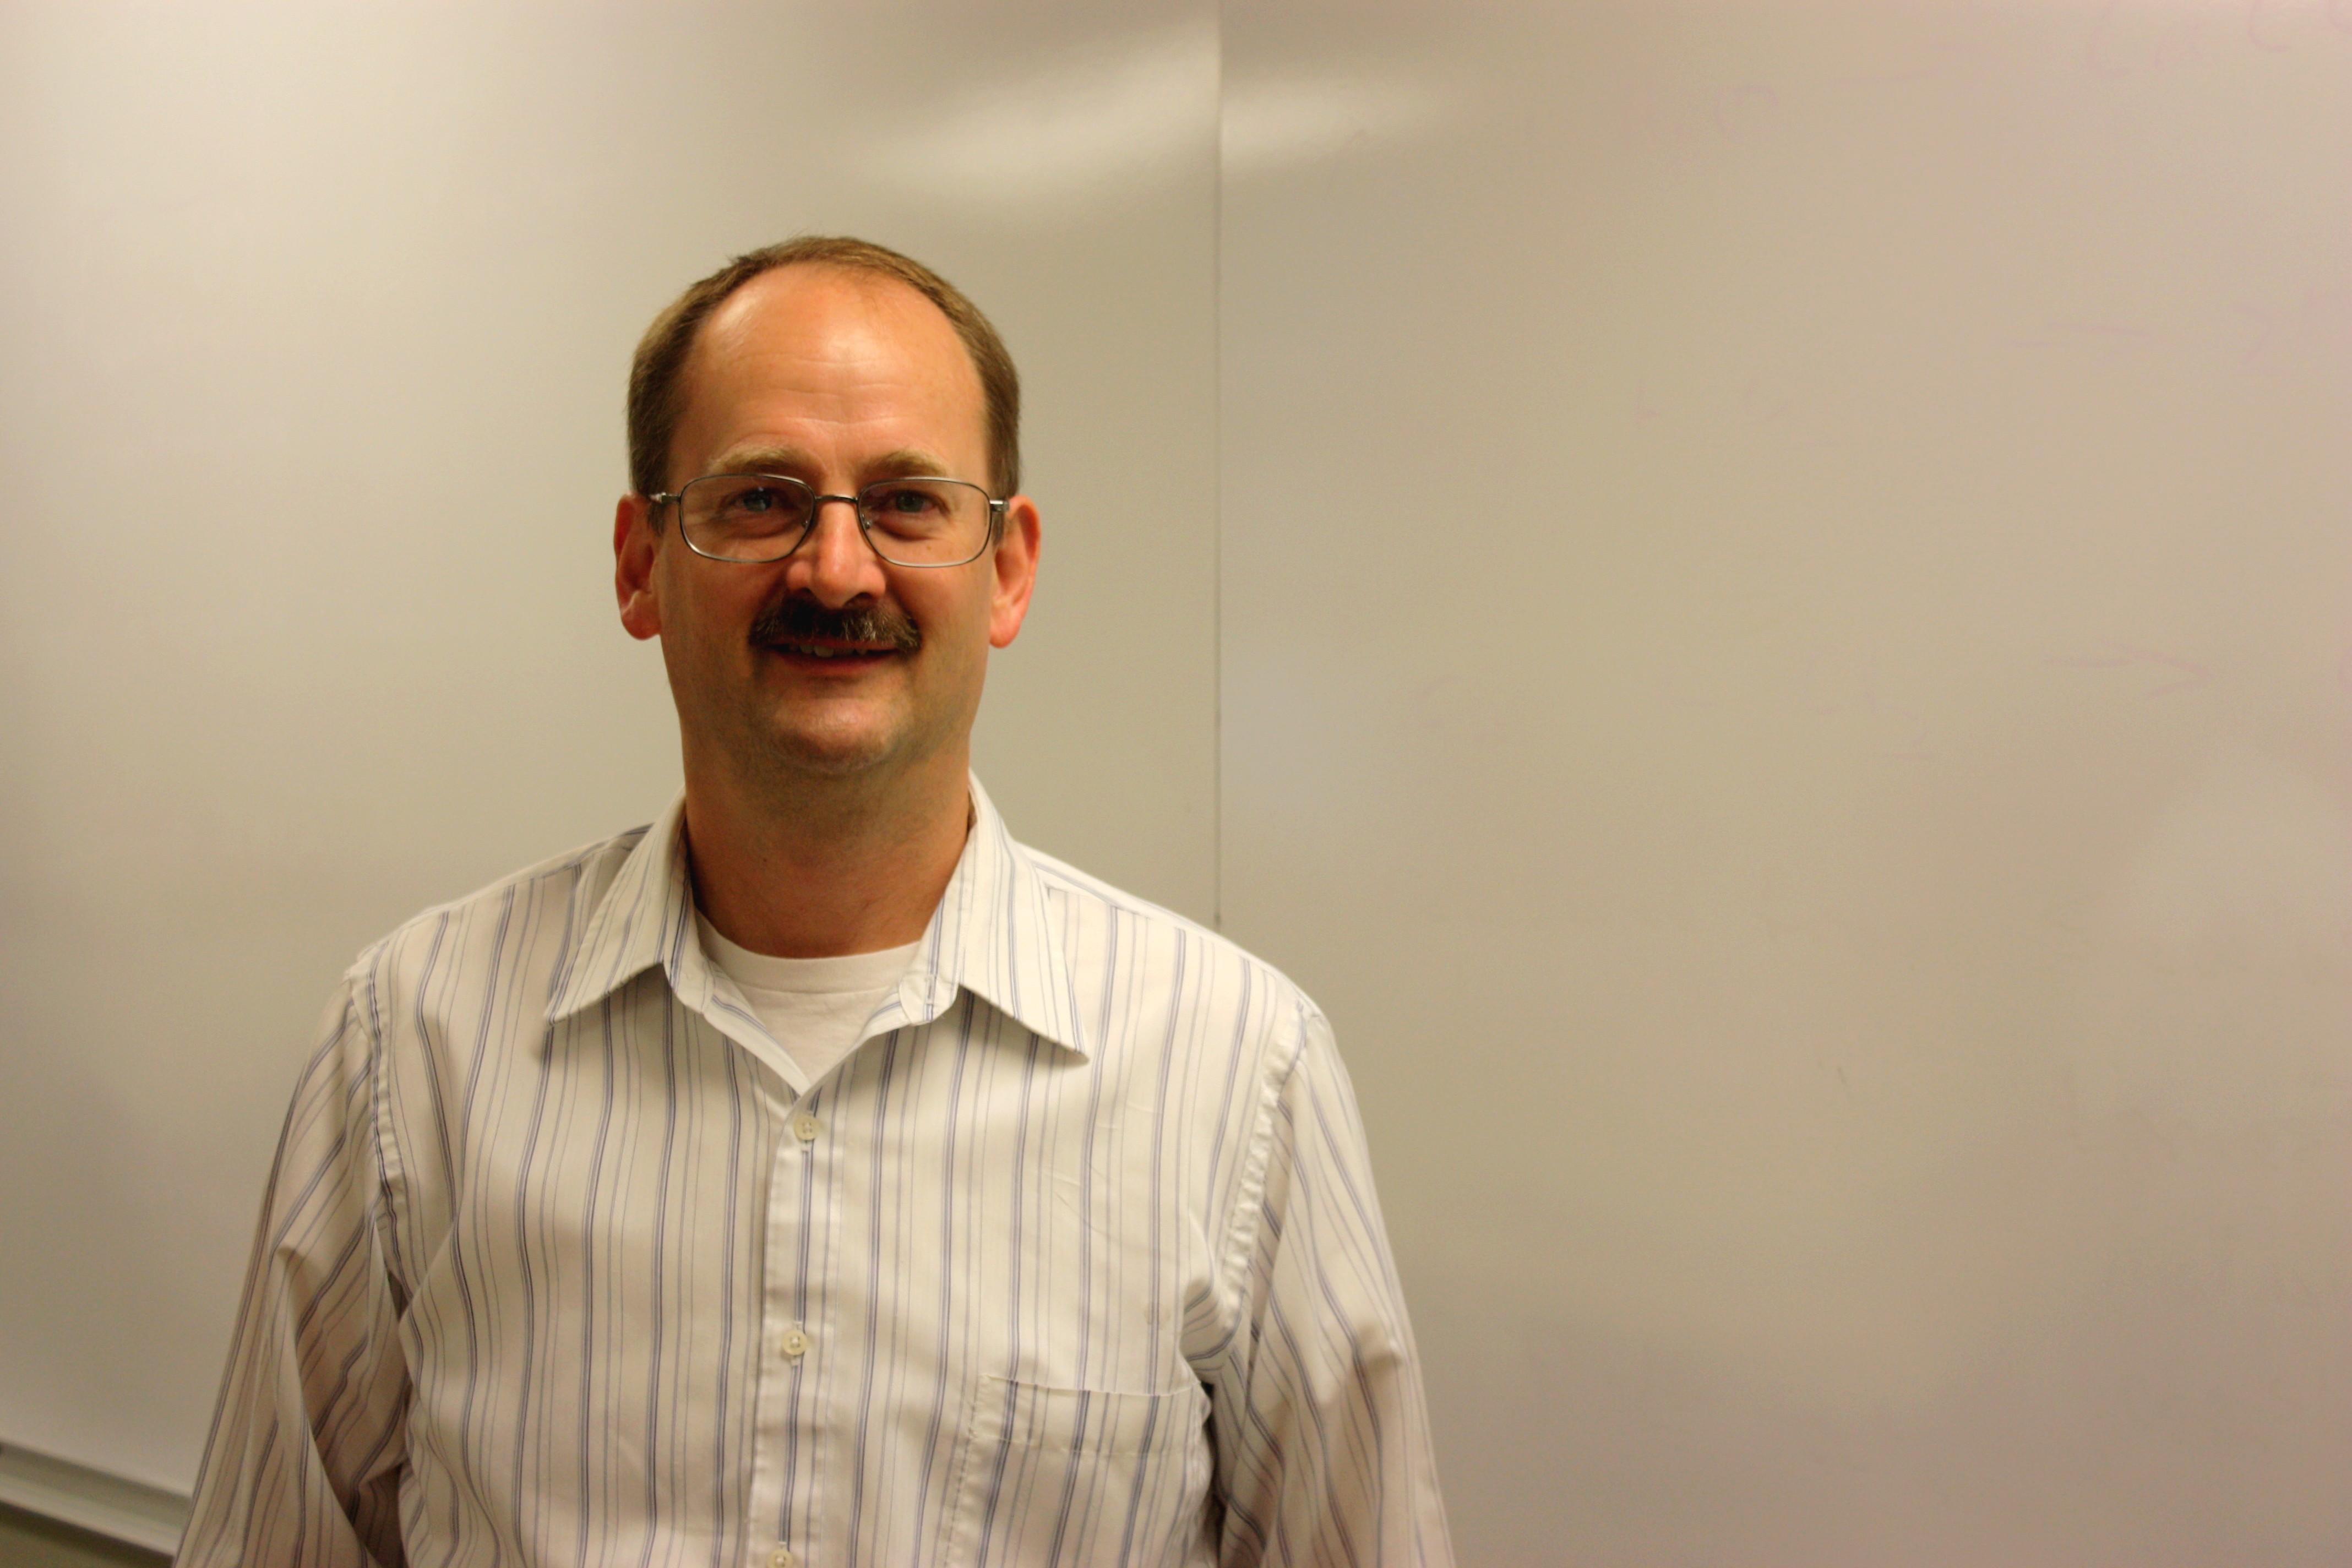 Portrait of Dan Smith in classroom